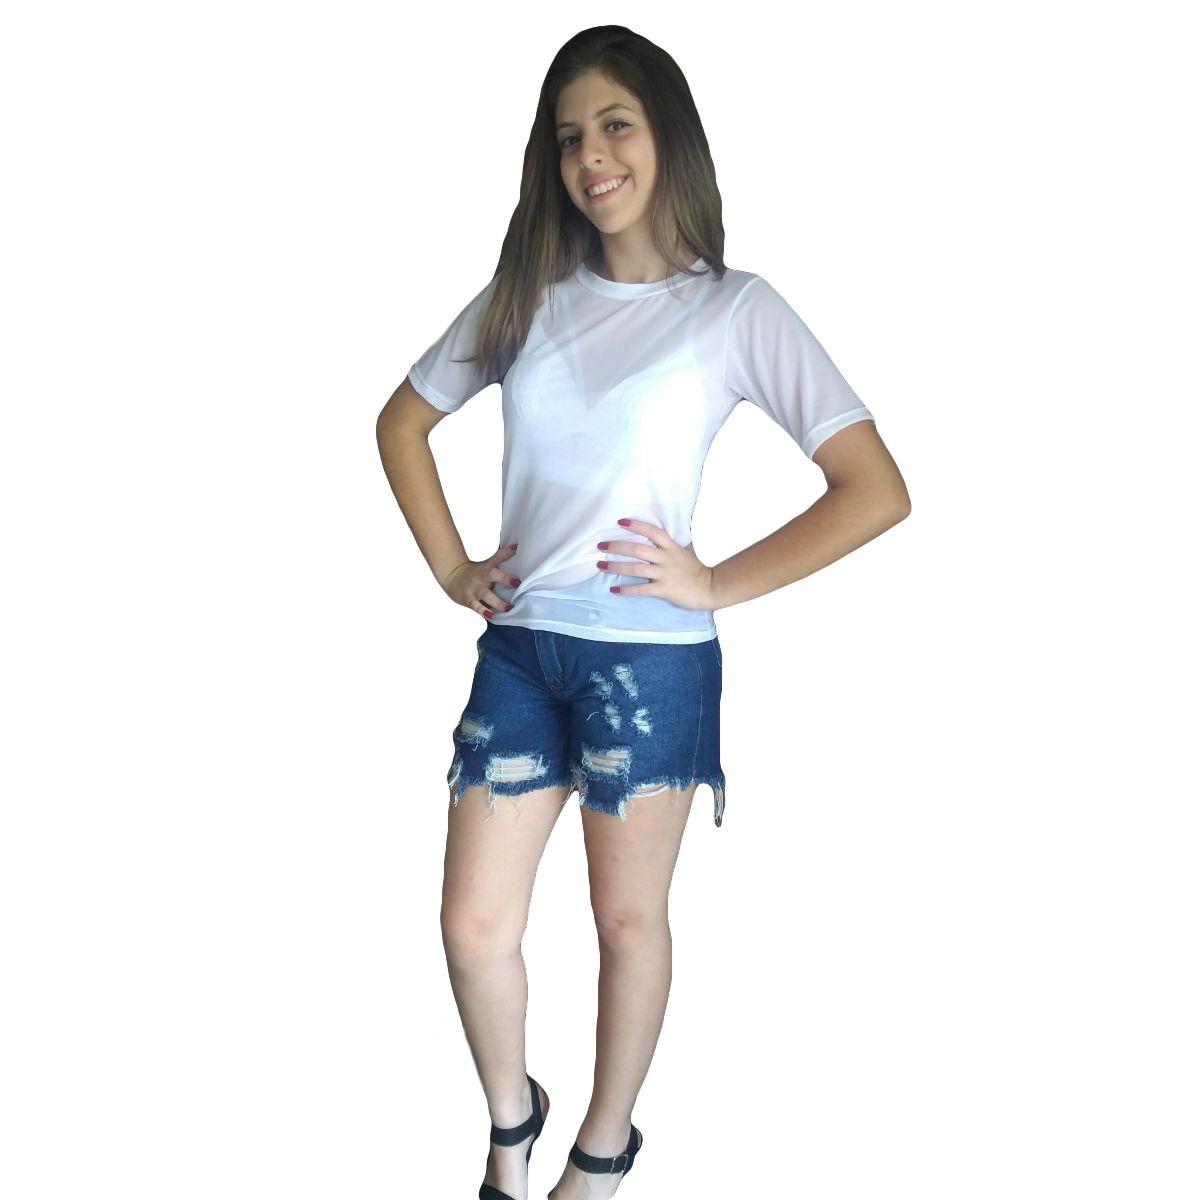 dddc968e20 ... varejo mercado livre  mercadolivre  comprar  blusas femininas  roupas  femininas  atacado  varejo